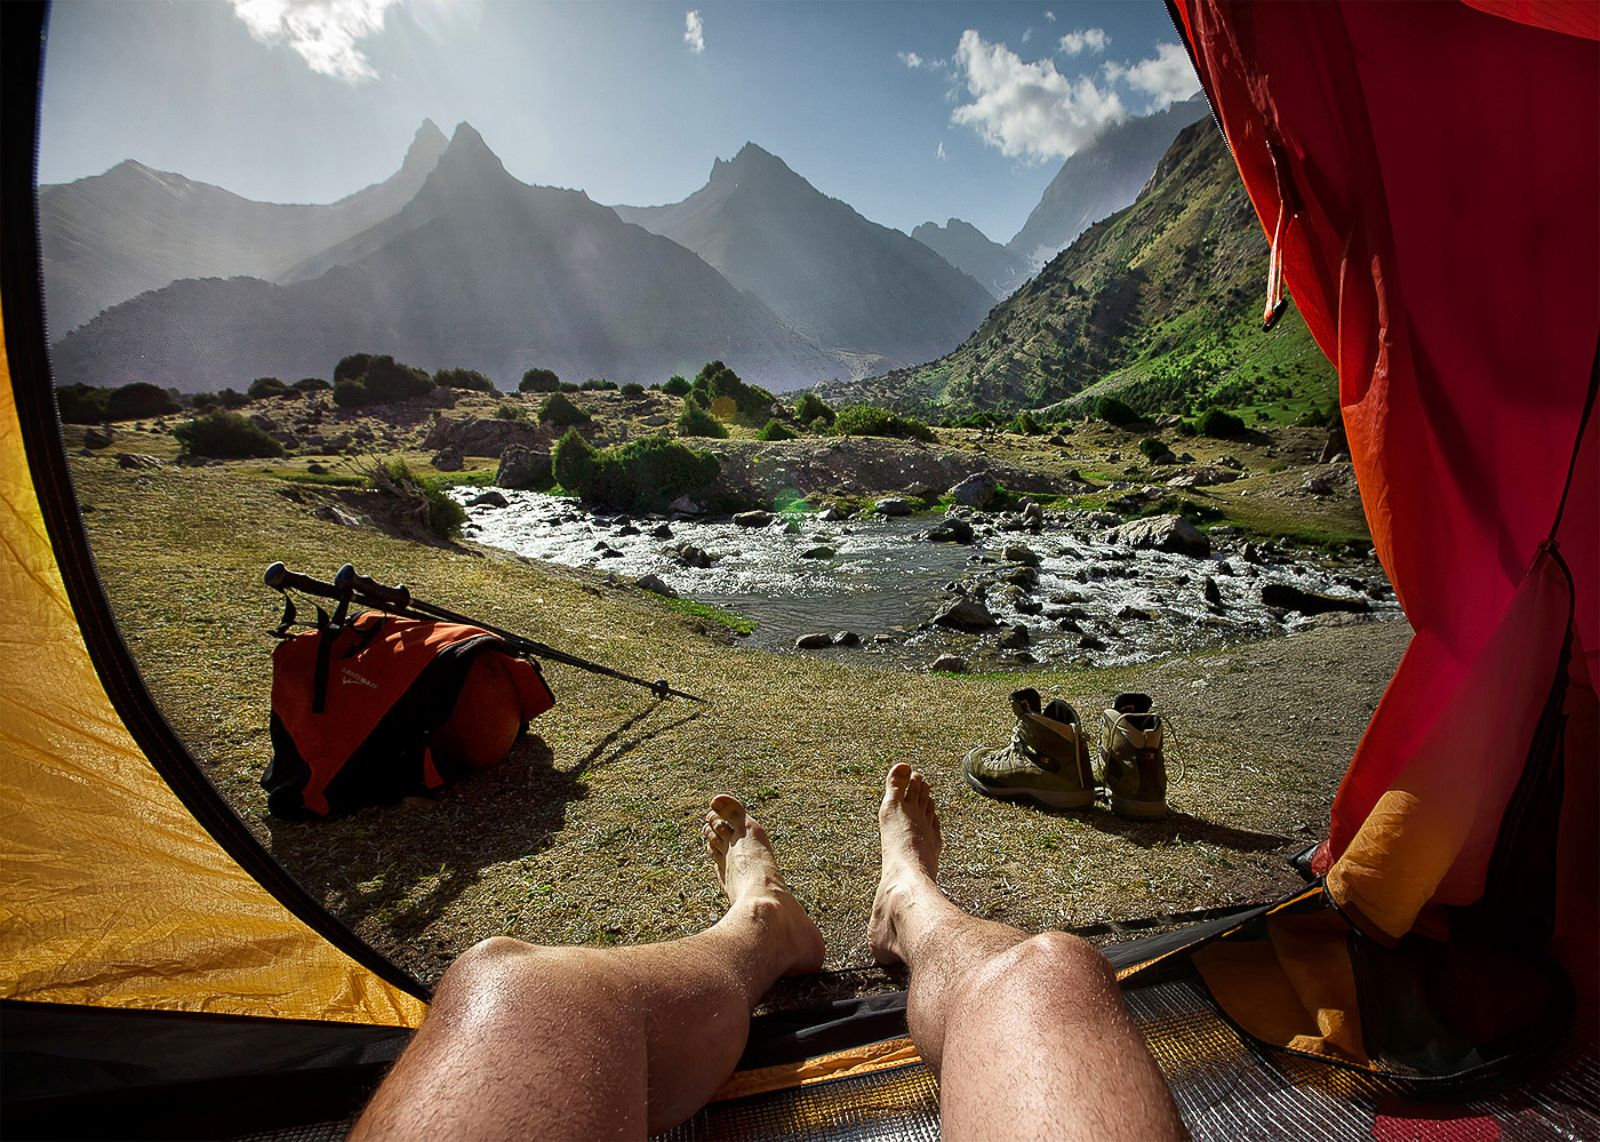 Секс на отдыхе в горах 18 фотография